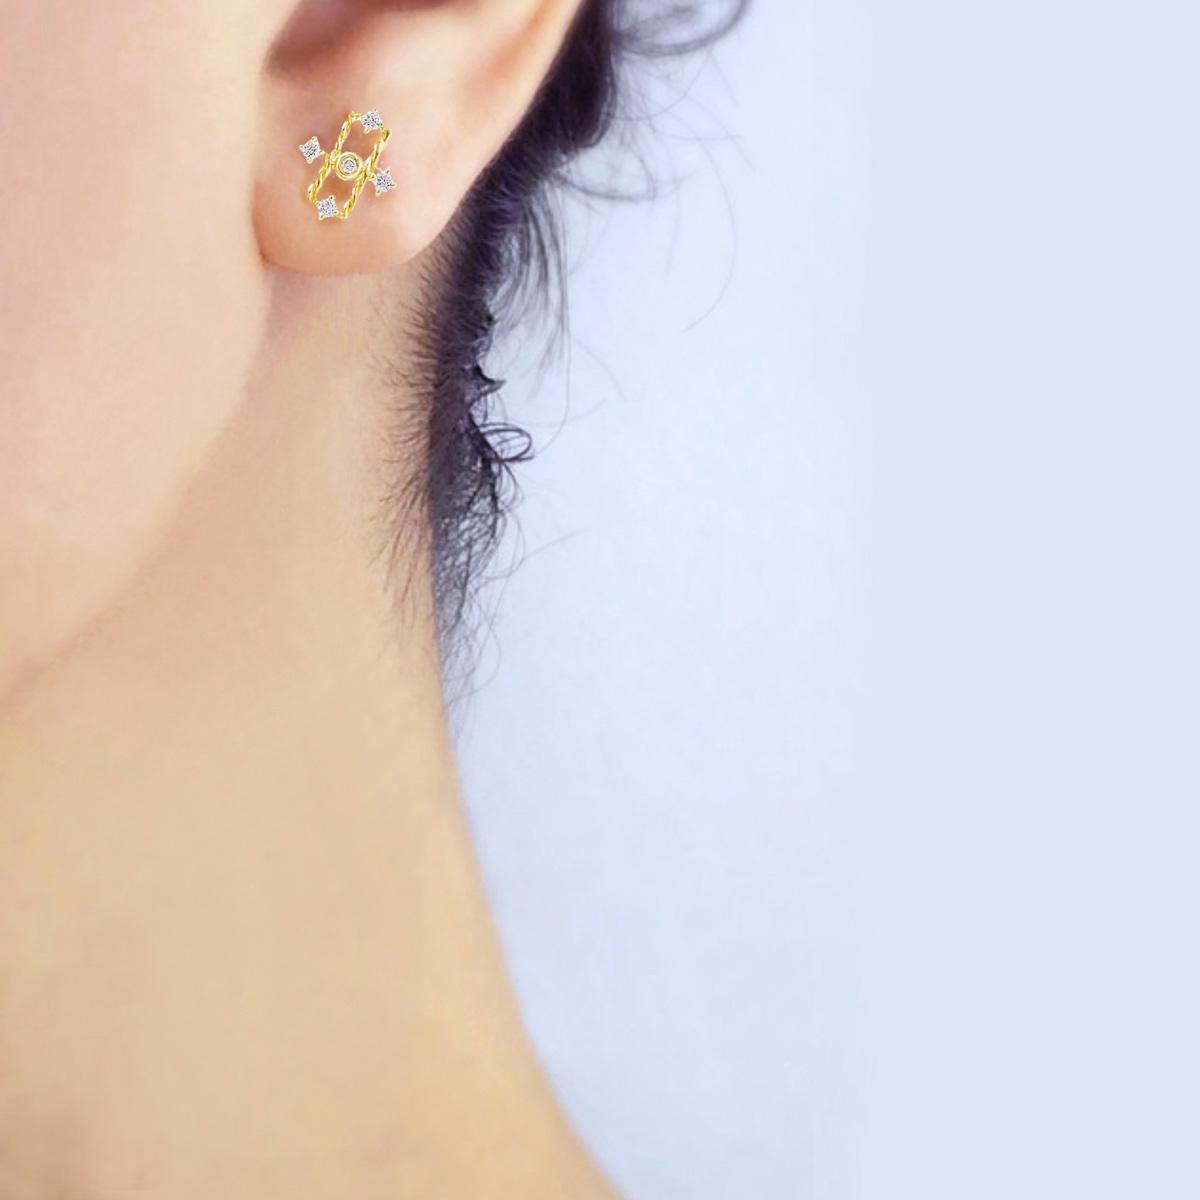 18k-Diamond-Mix-Setting-Five-Star-Twist-Stud_Earrings-JeweLyrie-Tulle-Collectio-TAT-E-08L-copy